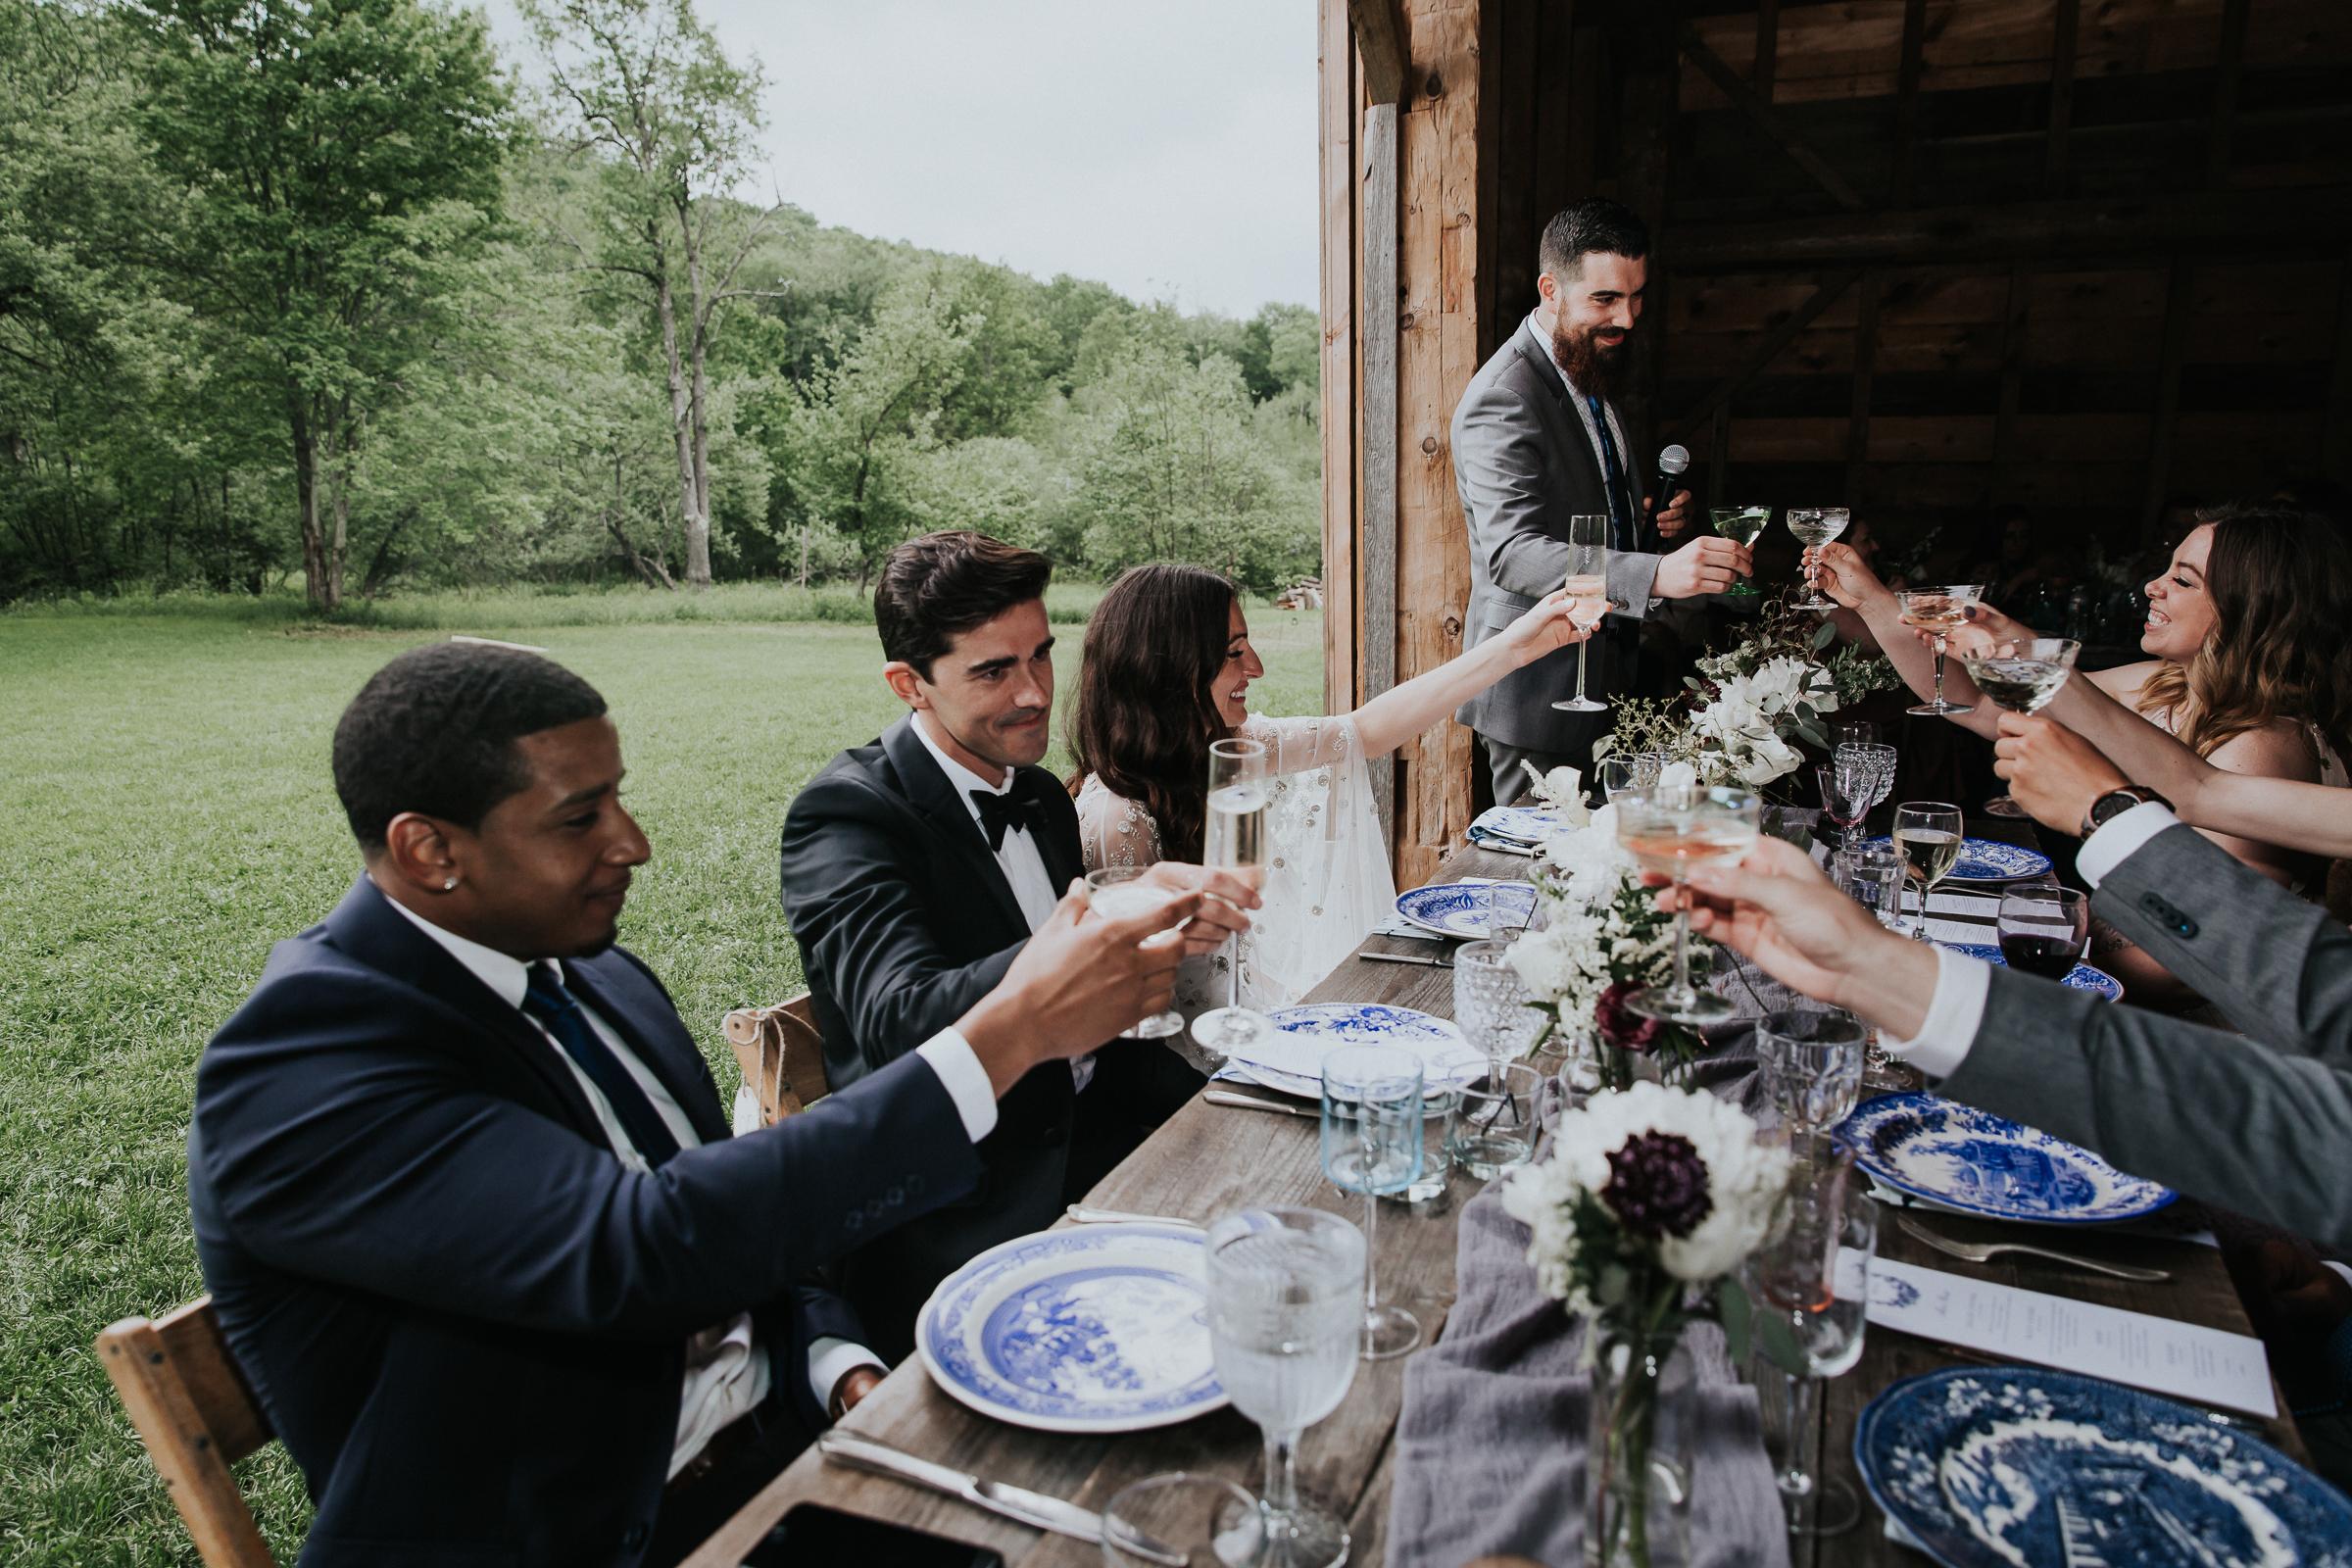 Handsome-Hollow-Long-Eddy-Catskills-New-York-Fine-Art-Documentary-Wedding-Photographer-119.jpg